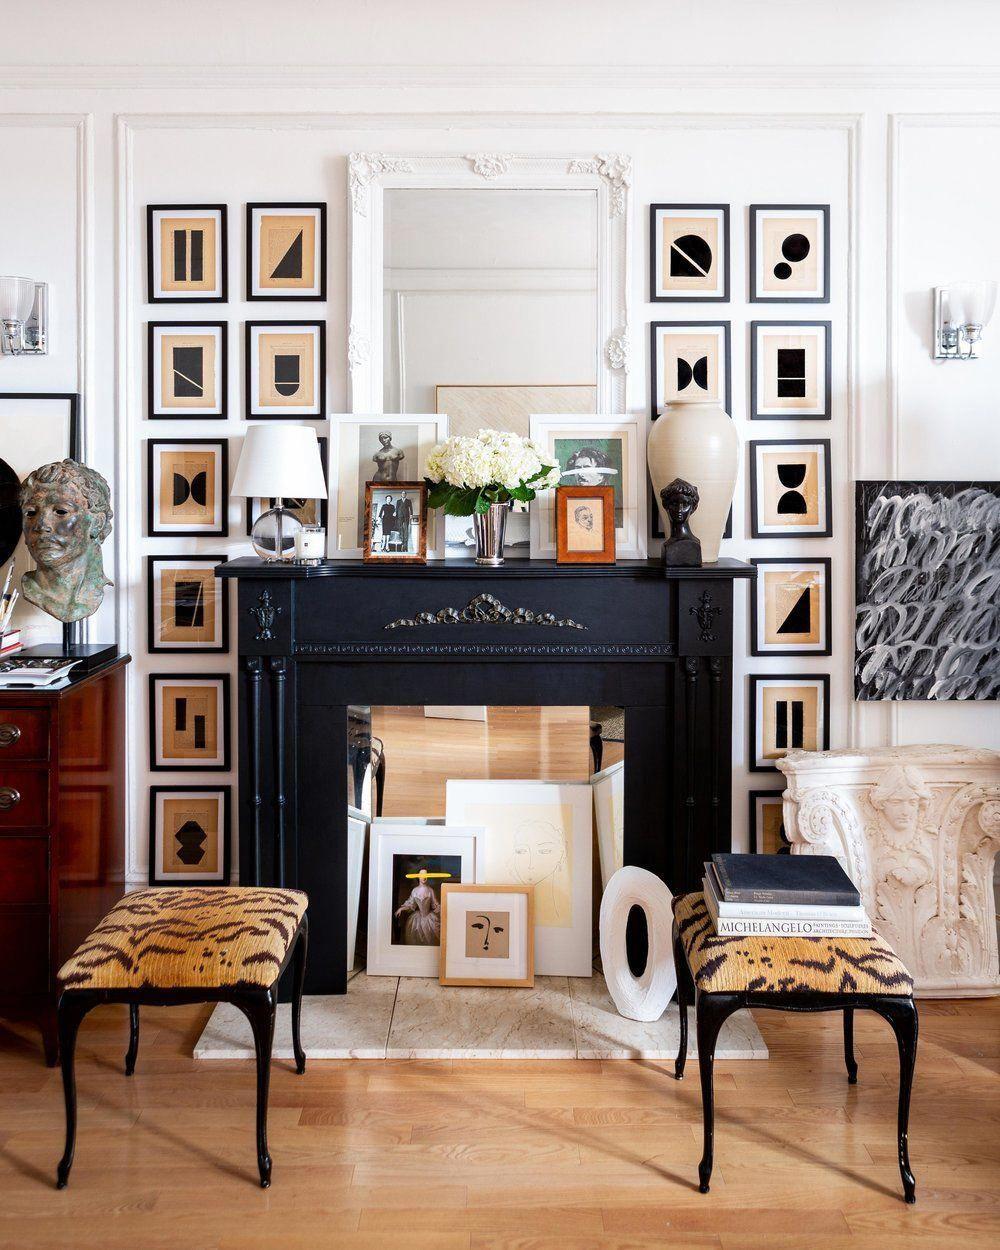 Home Decorating Magazines Usa Homedecoratinggamesfree Interior